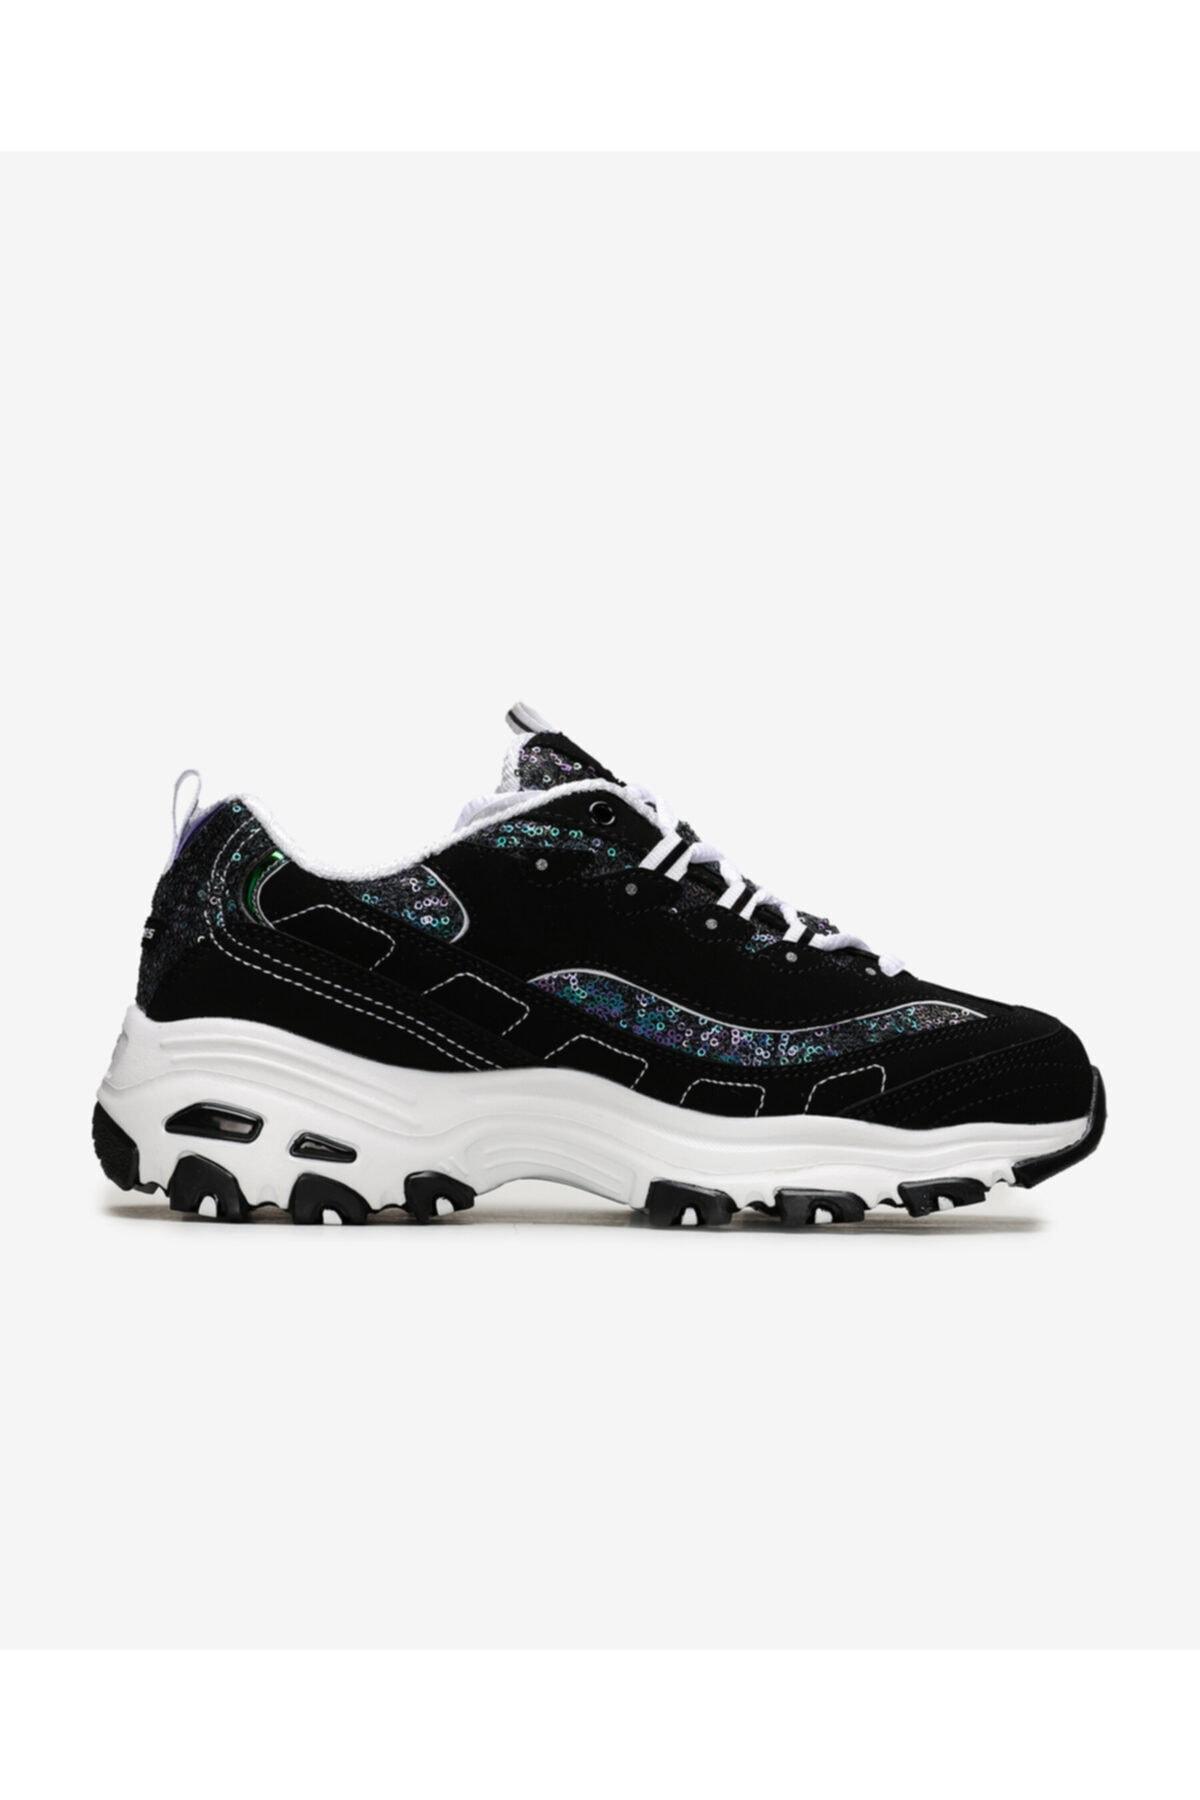 SKECHERS D'LITES-FAME & FORTUNE Kadın Siyah Sneakers 2